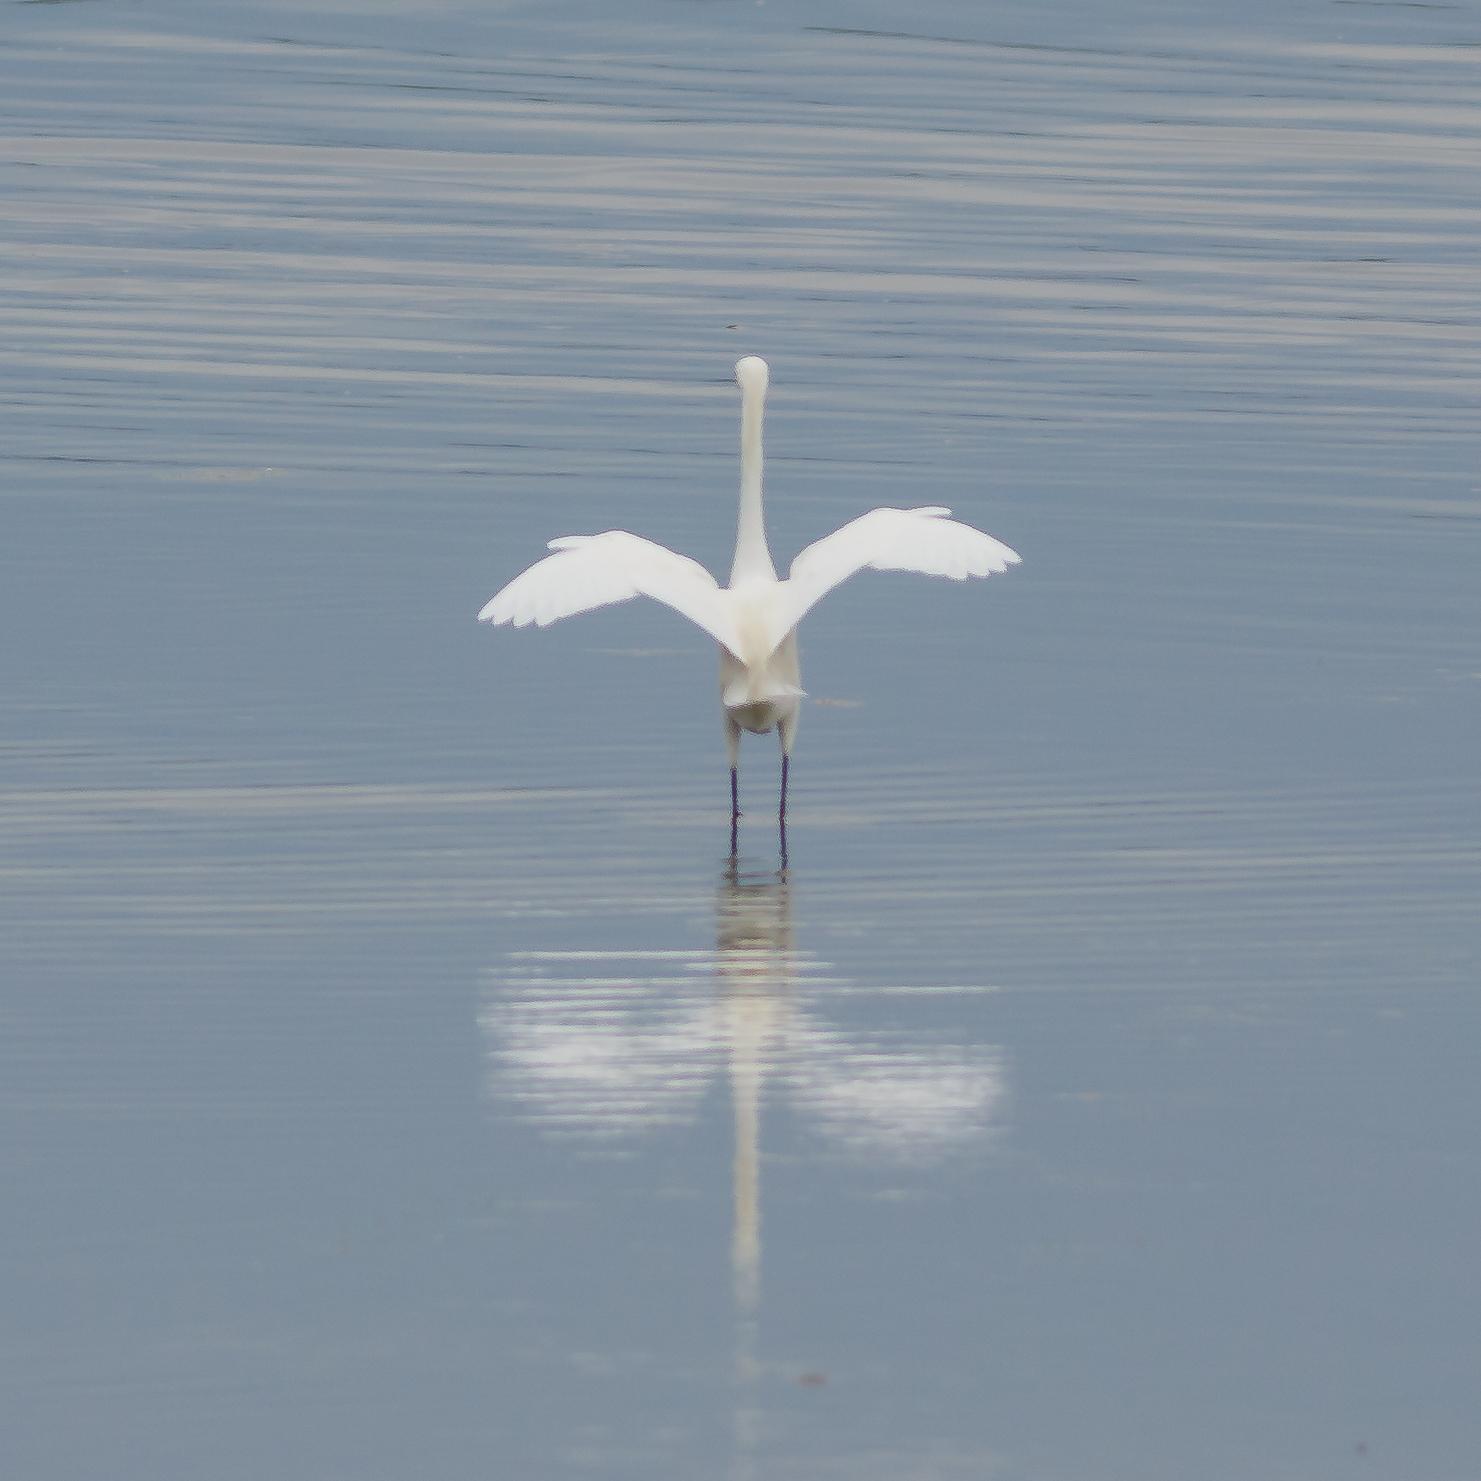 Egret - Image by Gary Detonnancourt